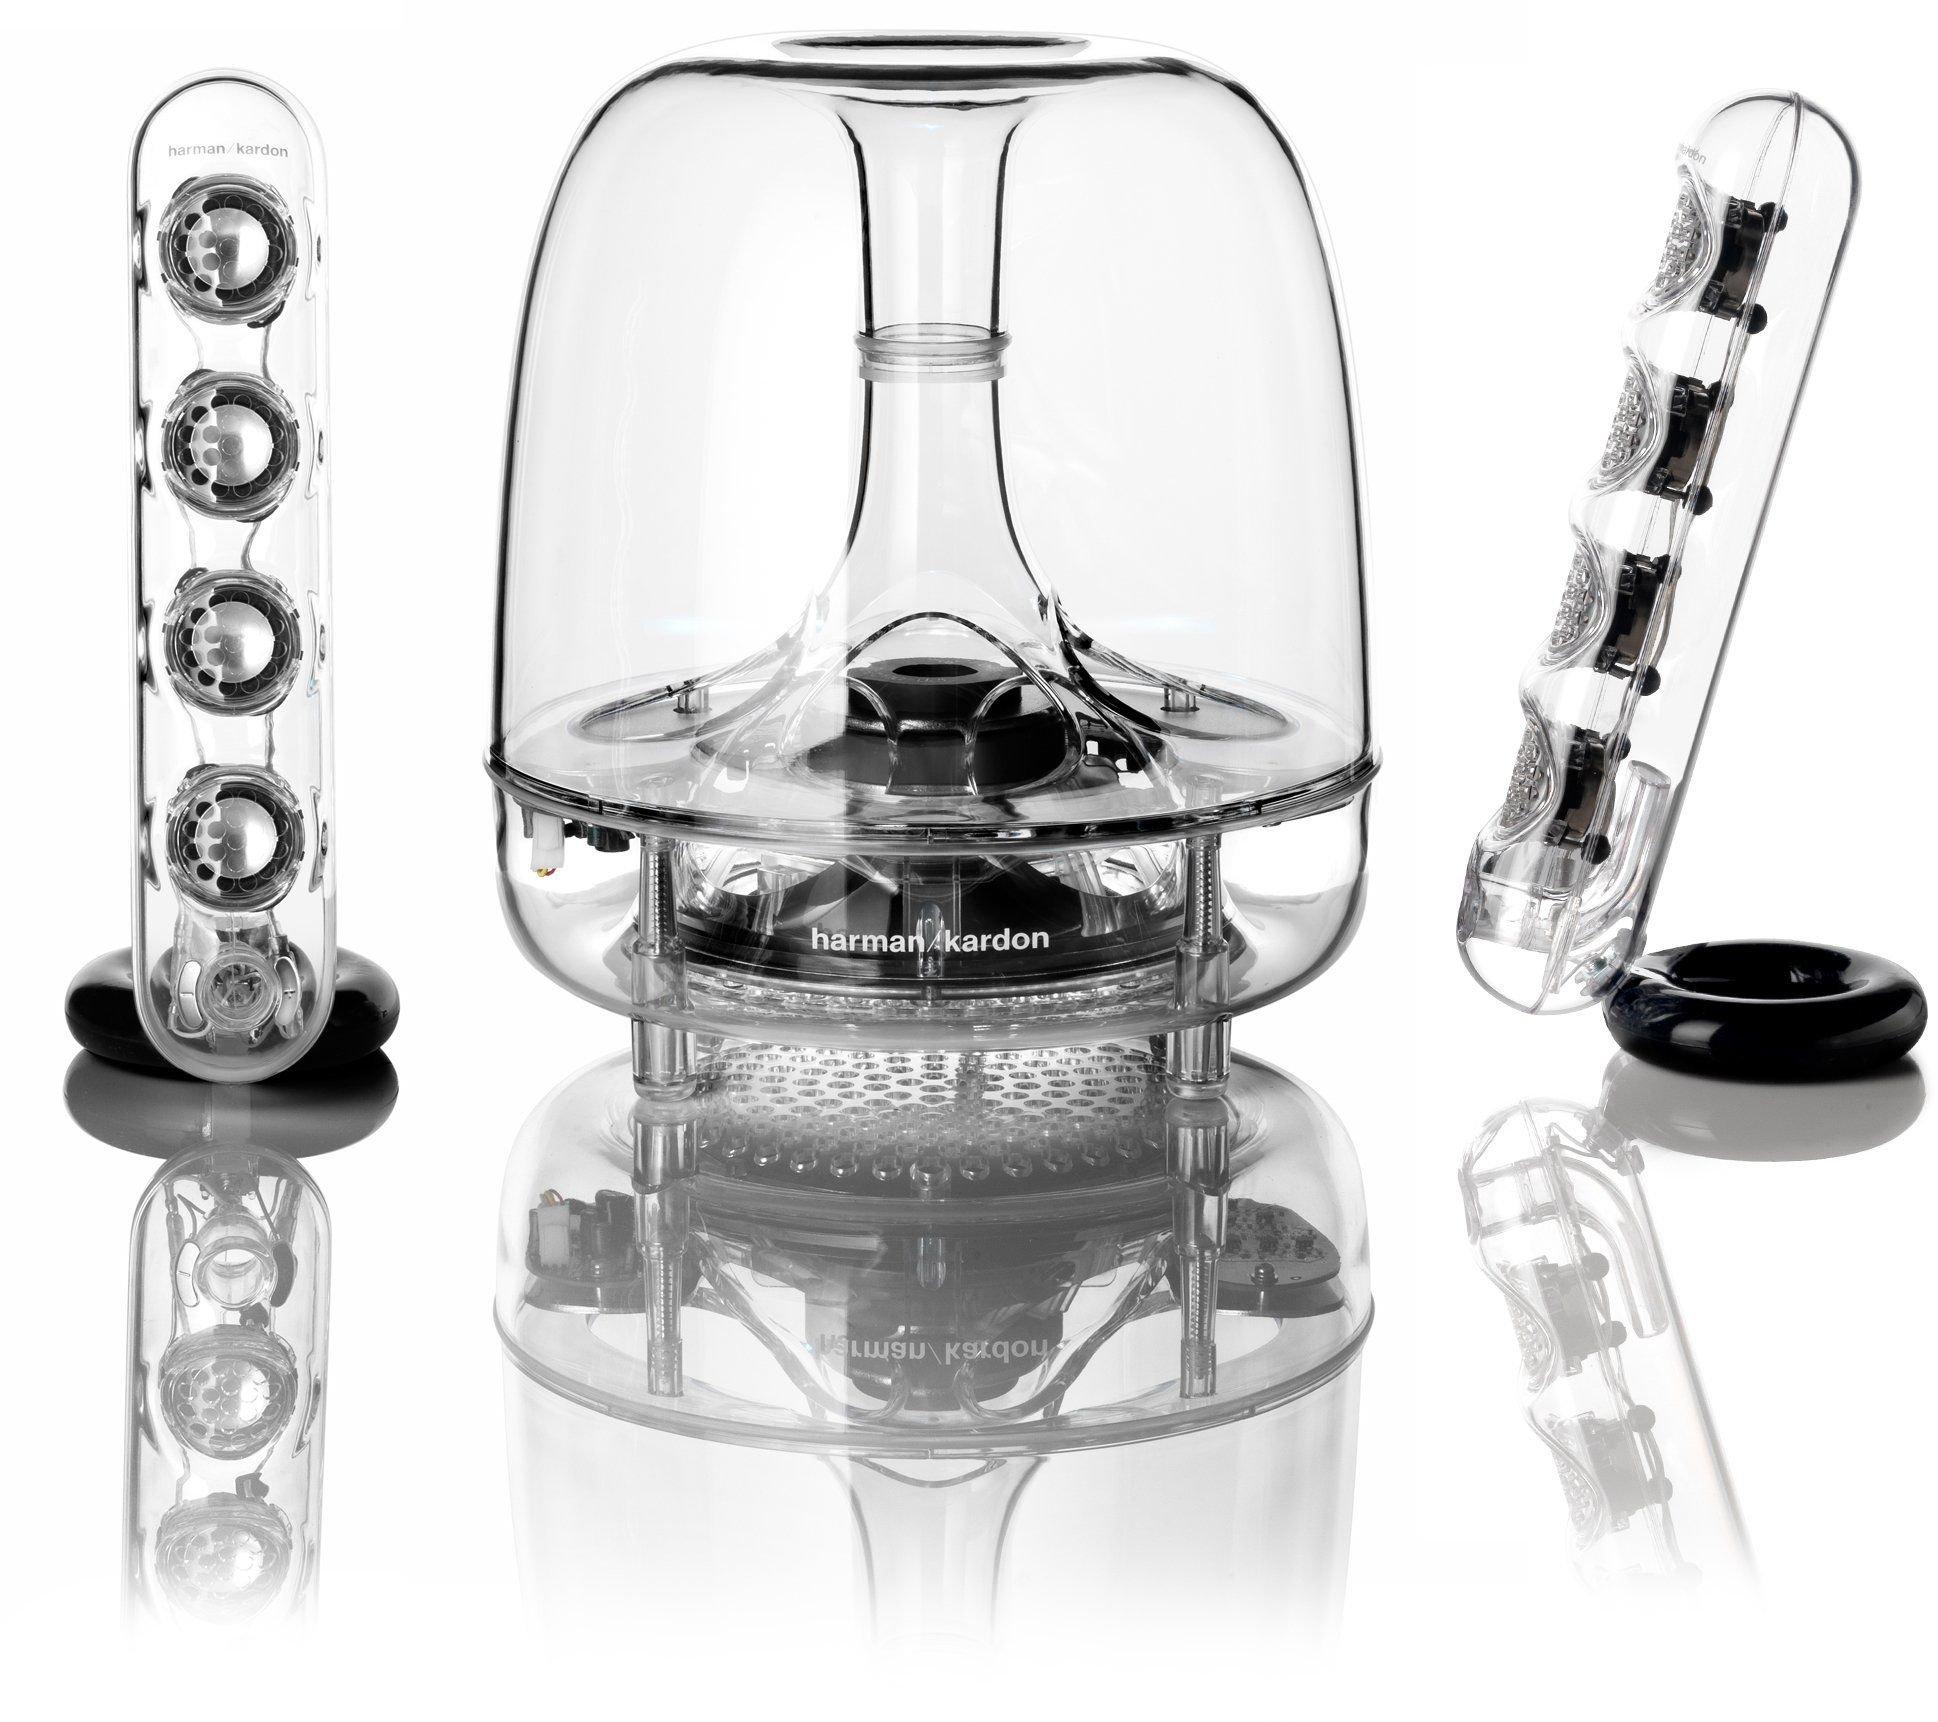 Harman Kardon SoundSticks III 2.1 Speaker System